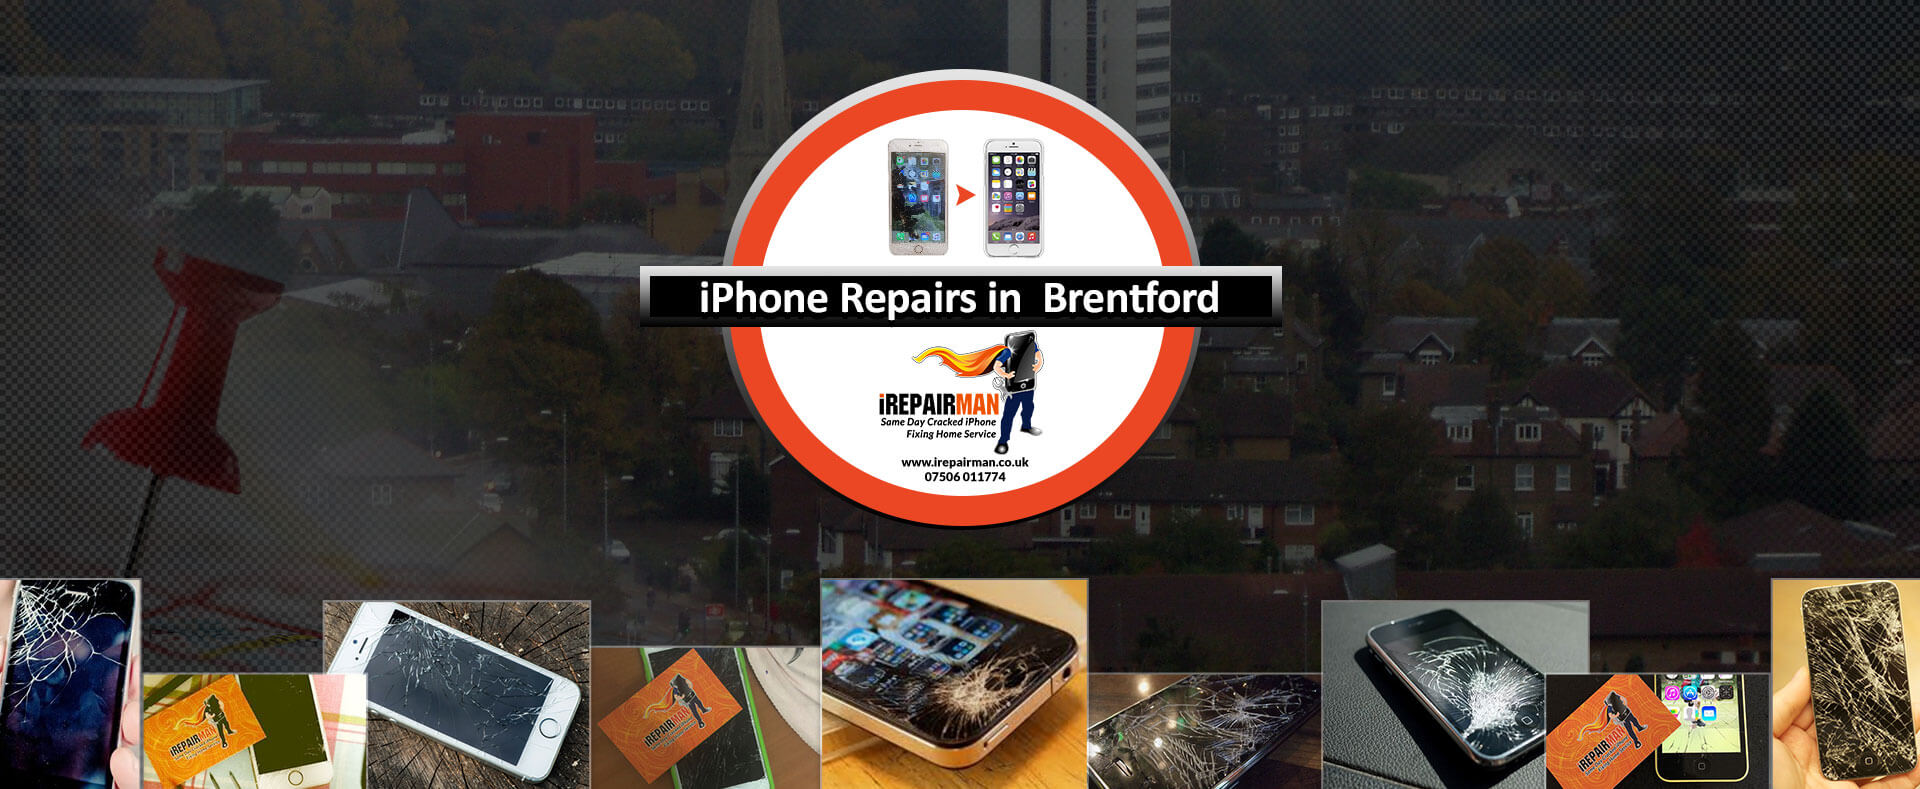 iPhone Repairs in Brentford